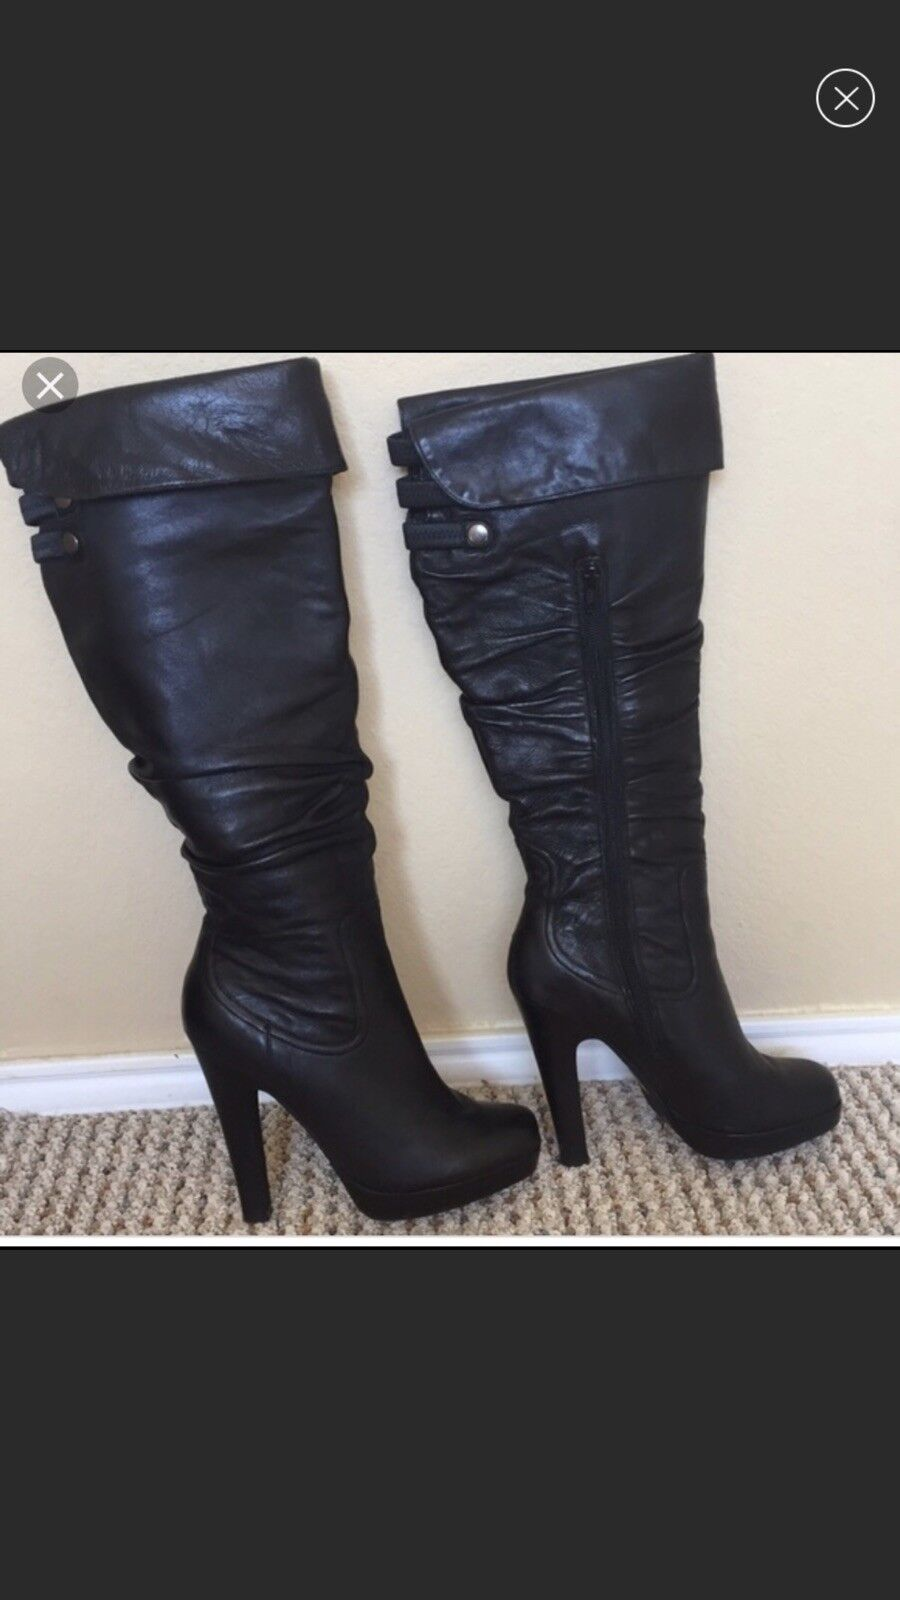 Jessica Simpson Knee High Stiefel Stiefel Stiefel 380279